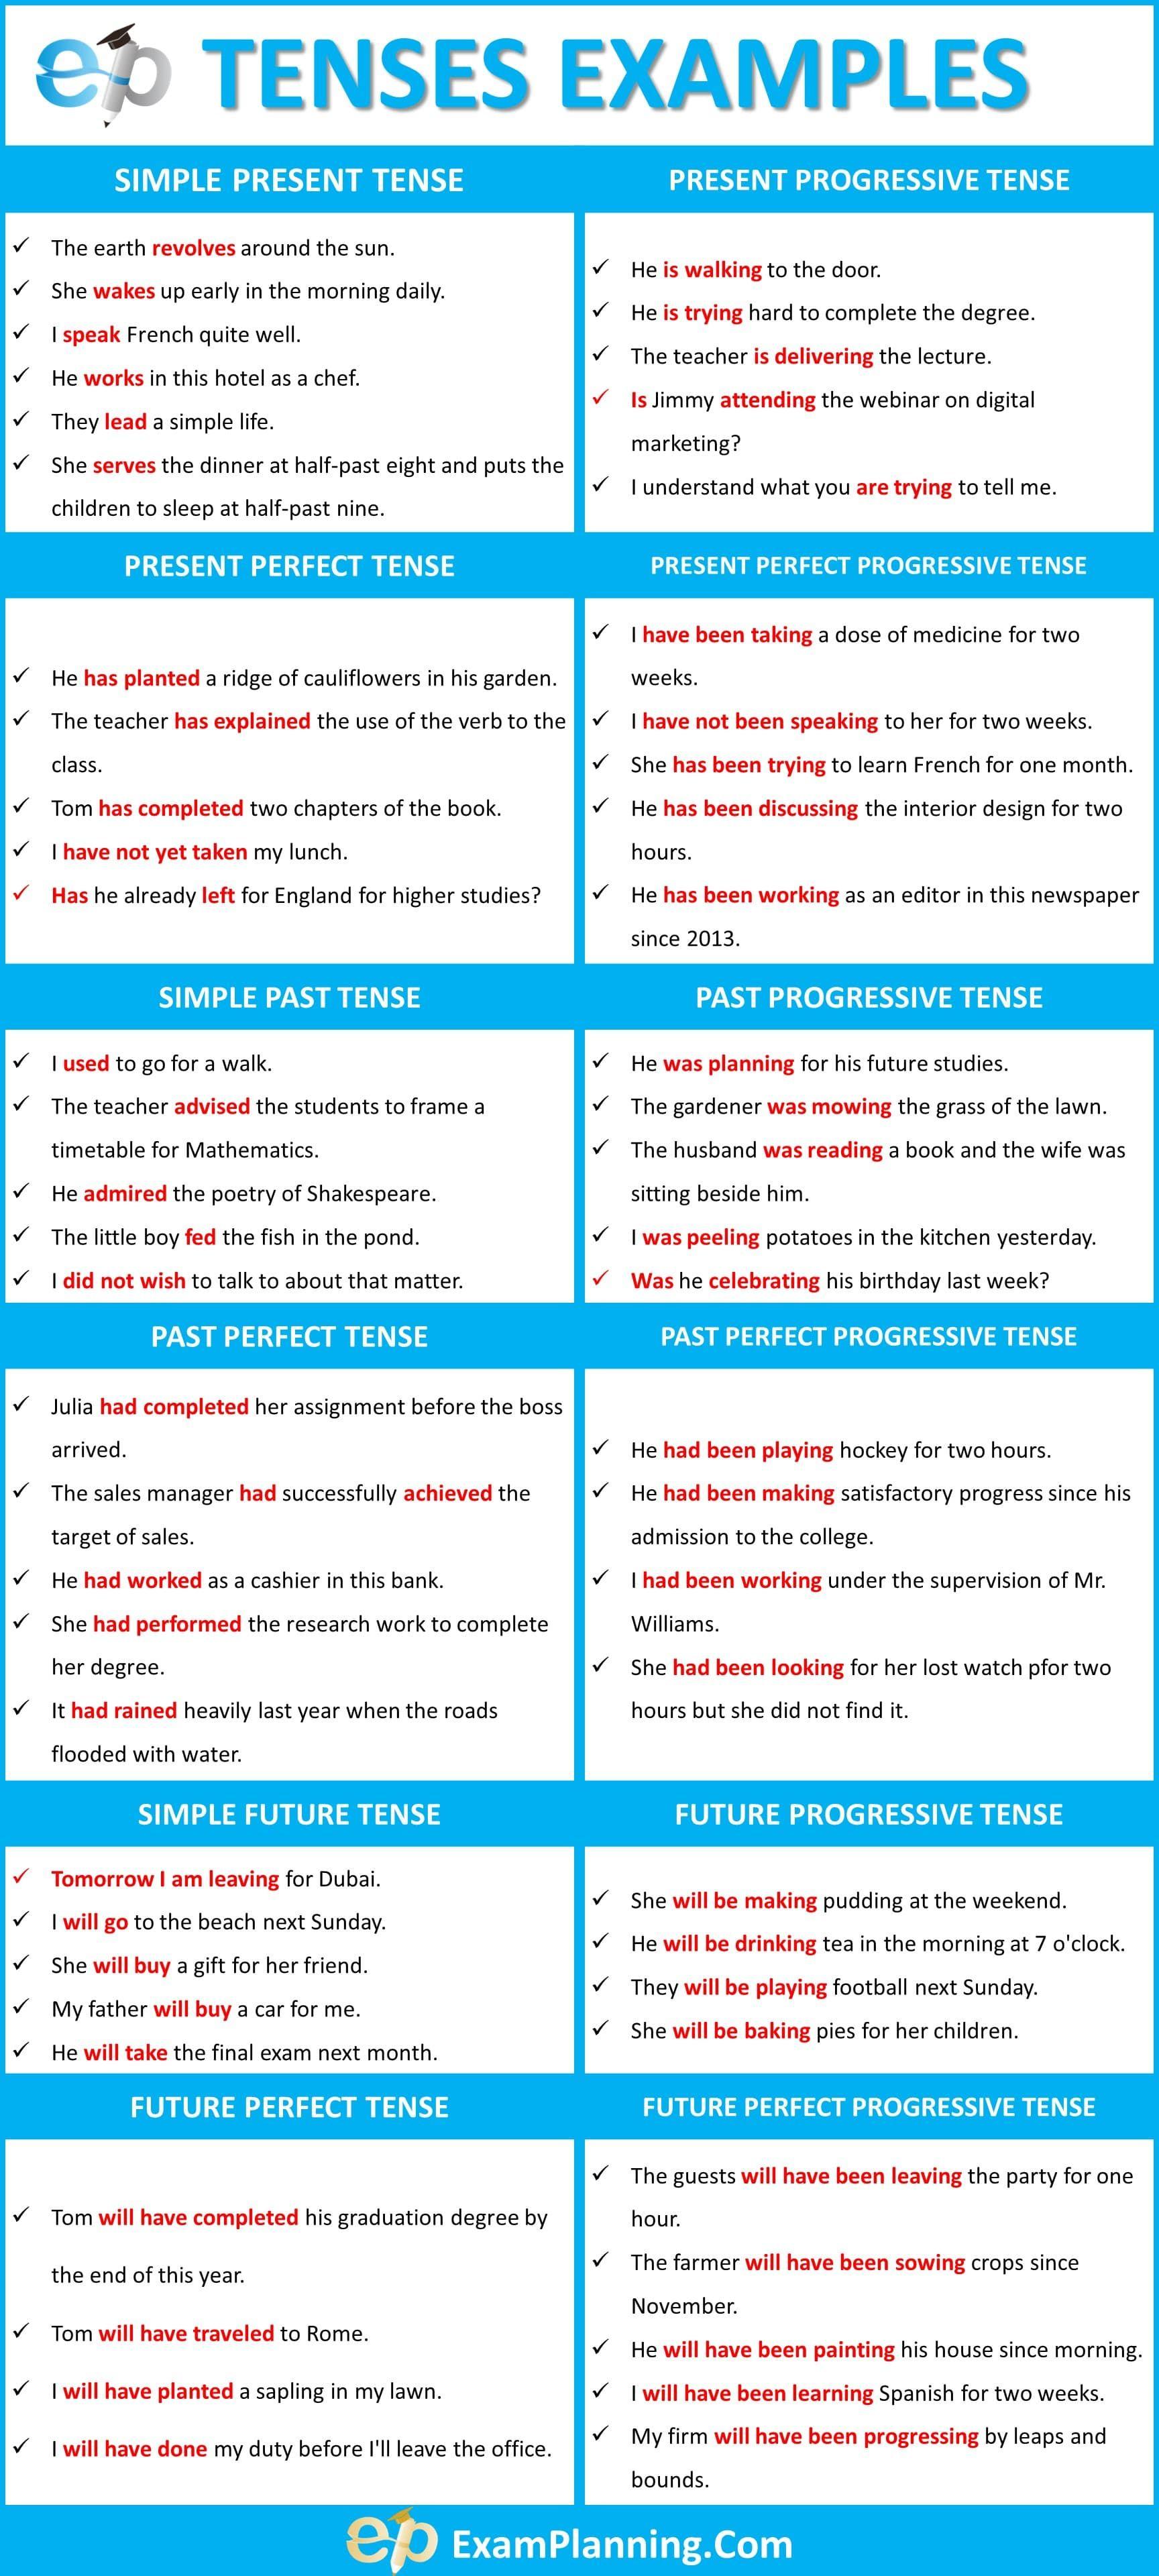 Tenses Examples 58 Sentences Of All Tenses